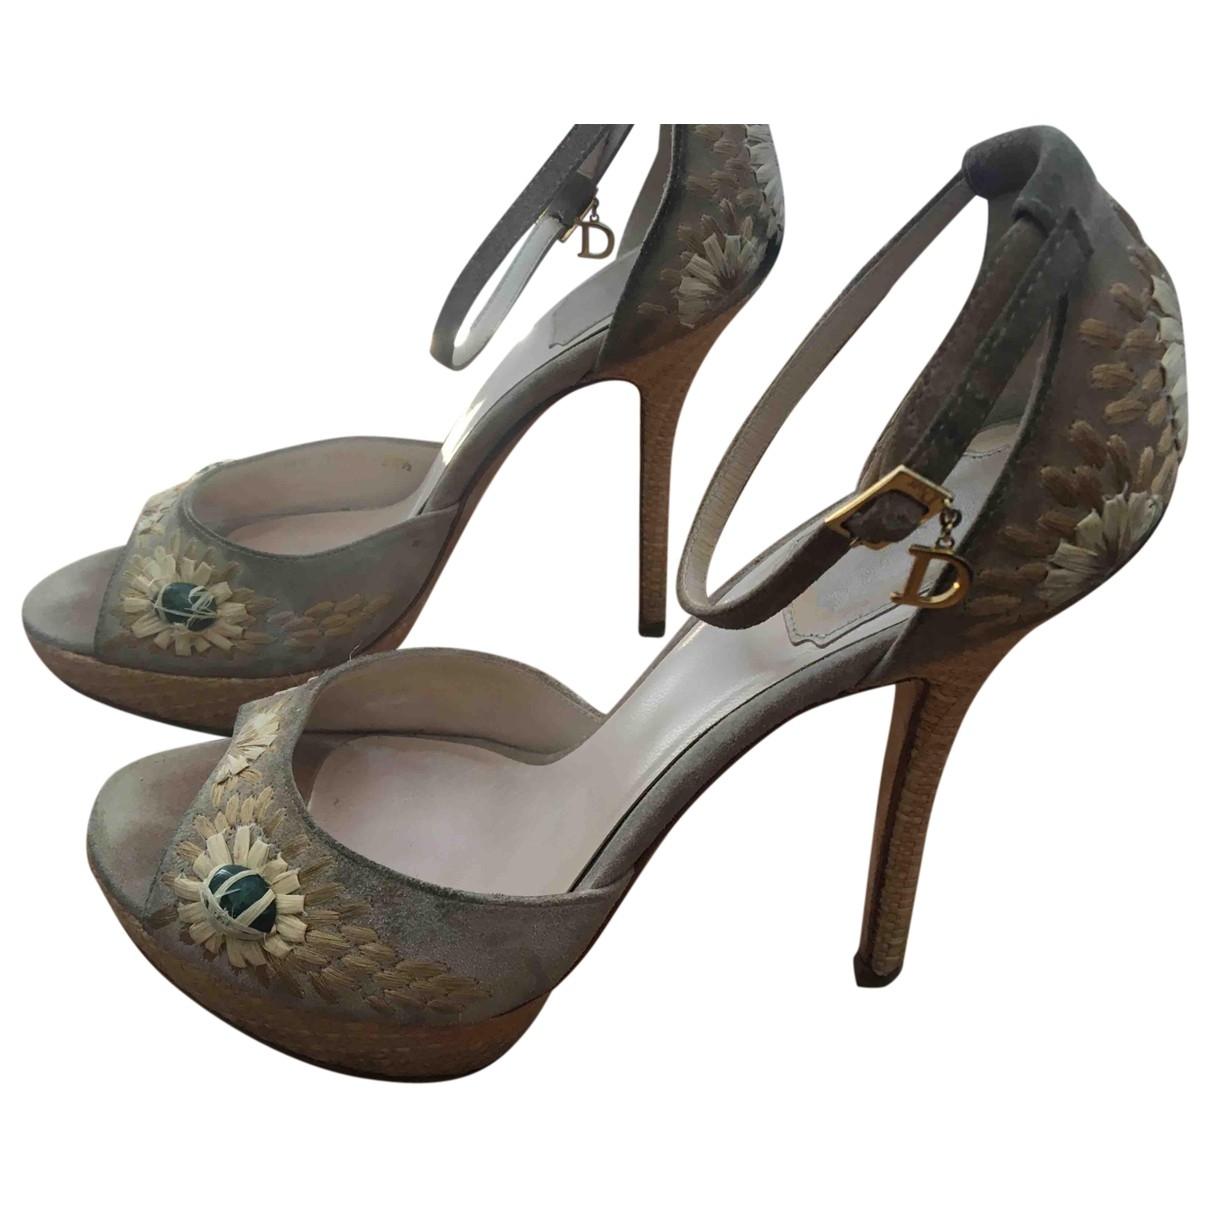 Dior \N Beige Suede Sandals for Women 38.5 EU